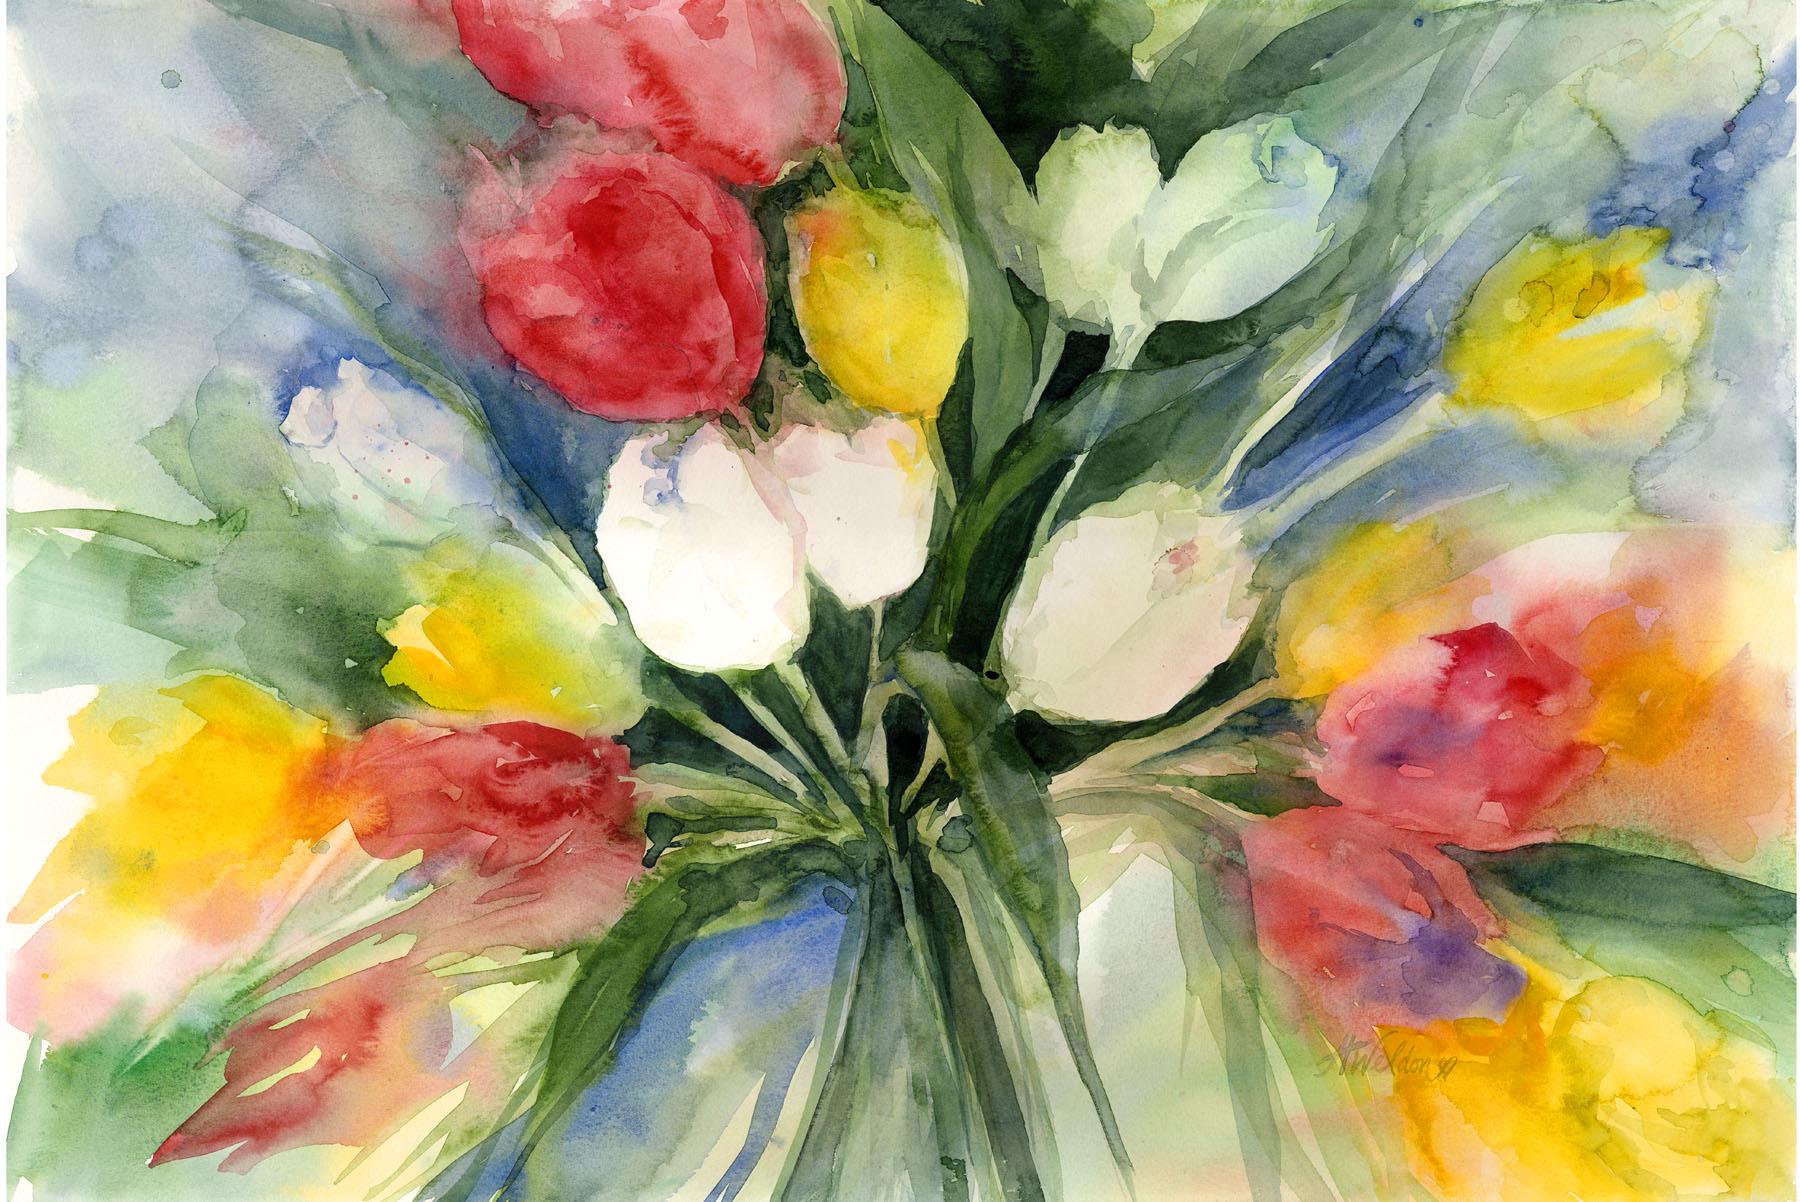 tulipexplosionjpg.jpg